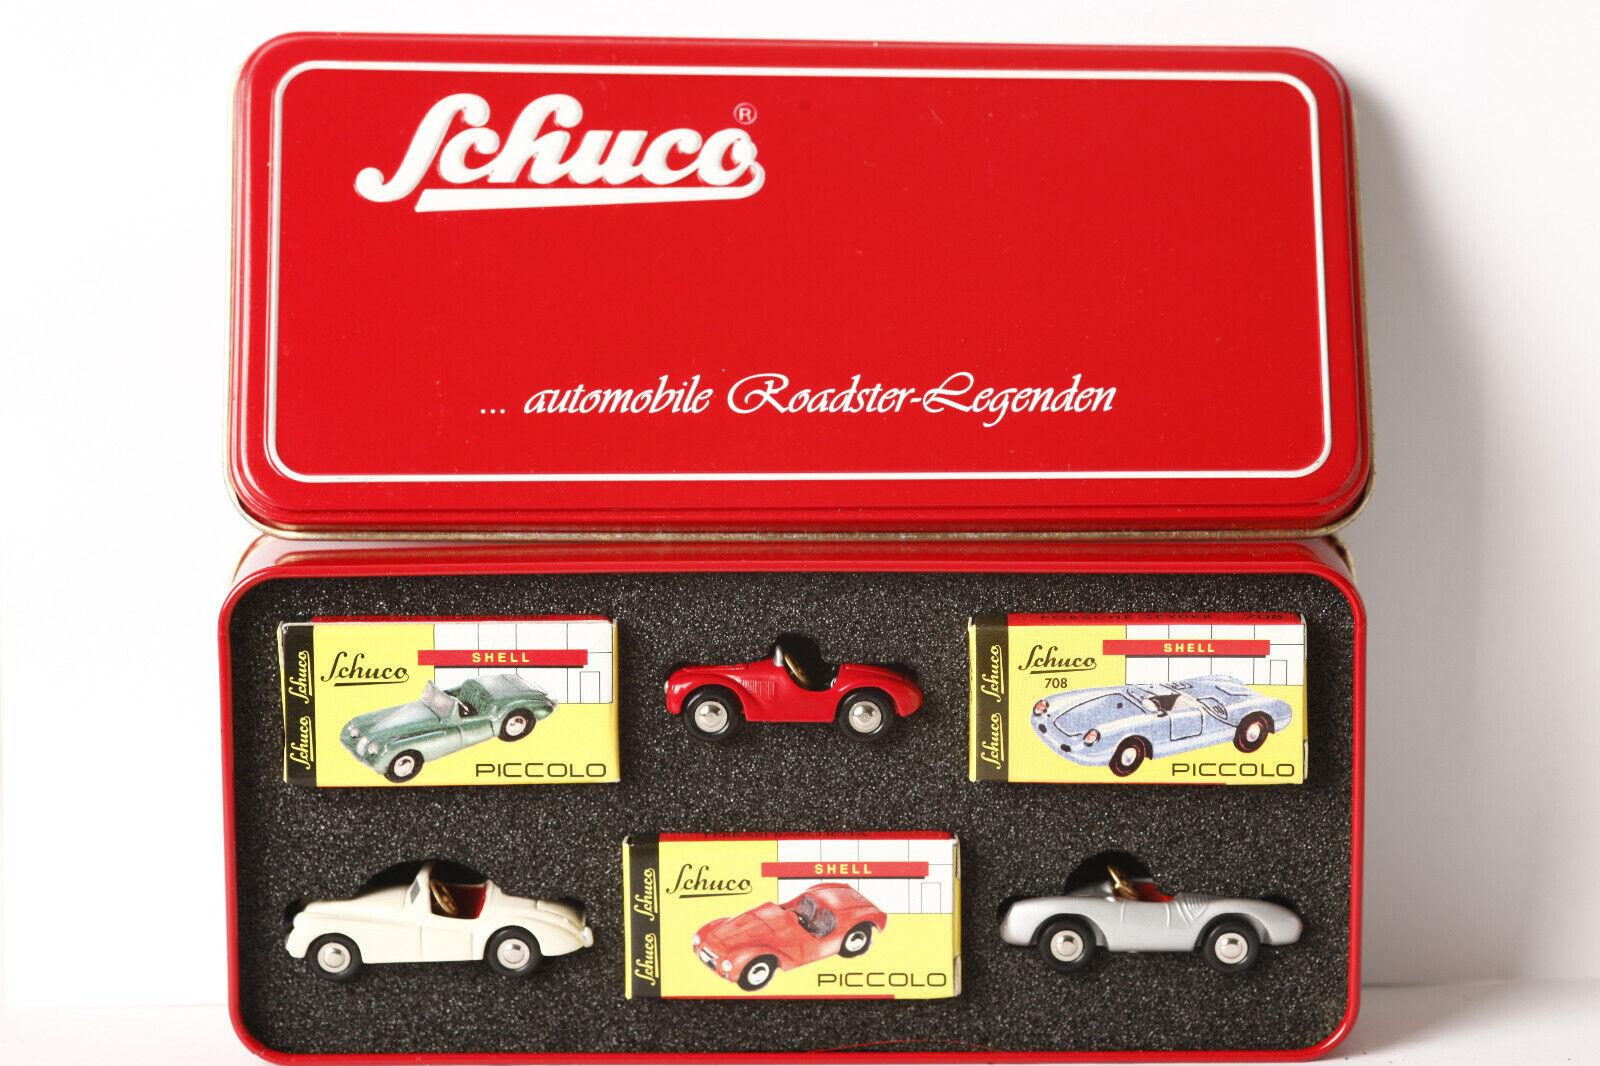 Venta barata Schuco Piccolo 77302 3er set roadster leyendas xx120 xx120 xx120 barchetta Spyder (65100)  oferta especial